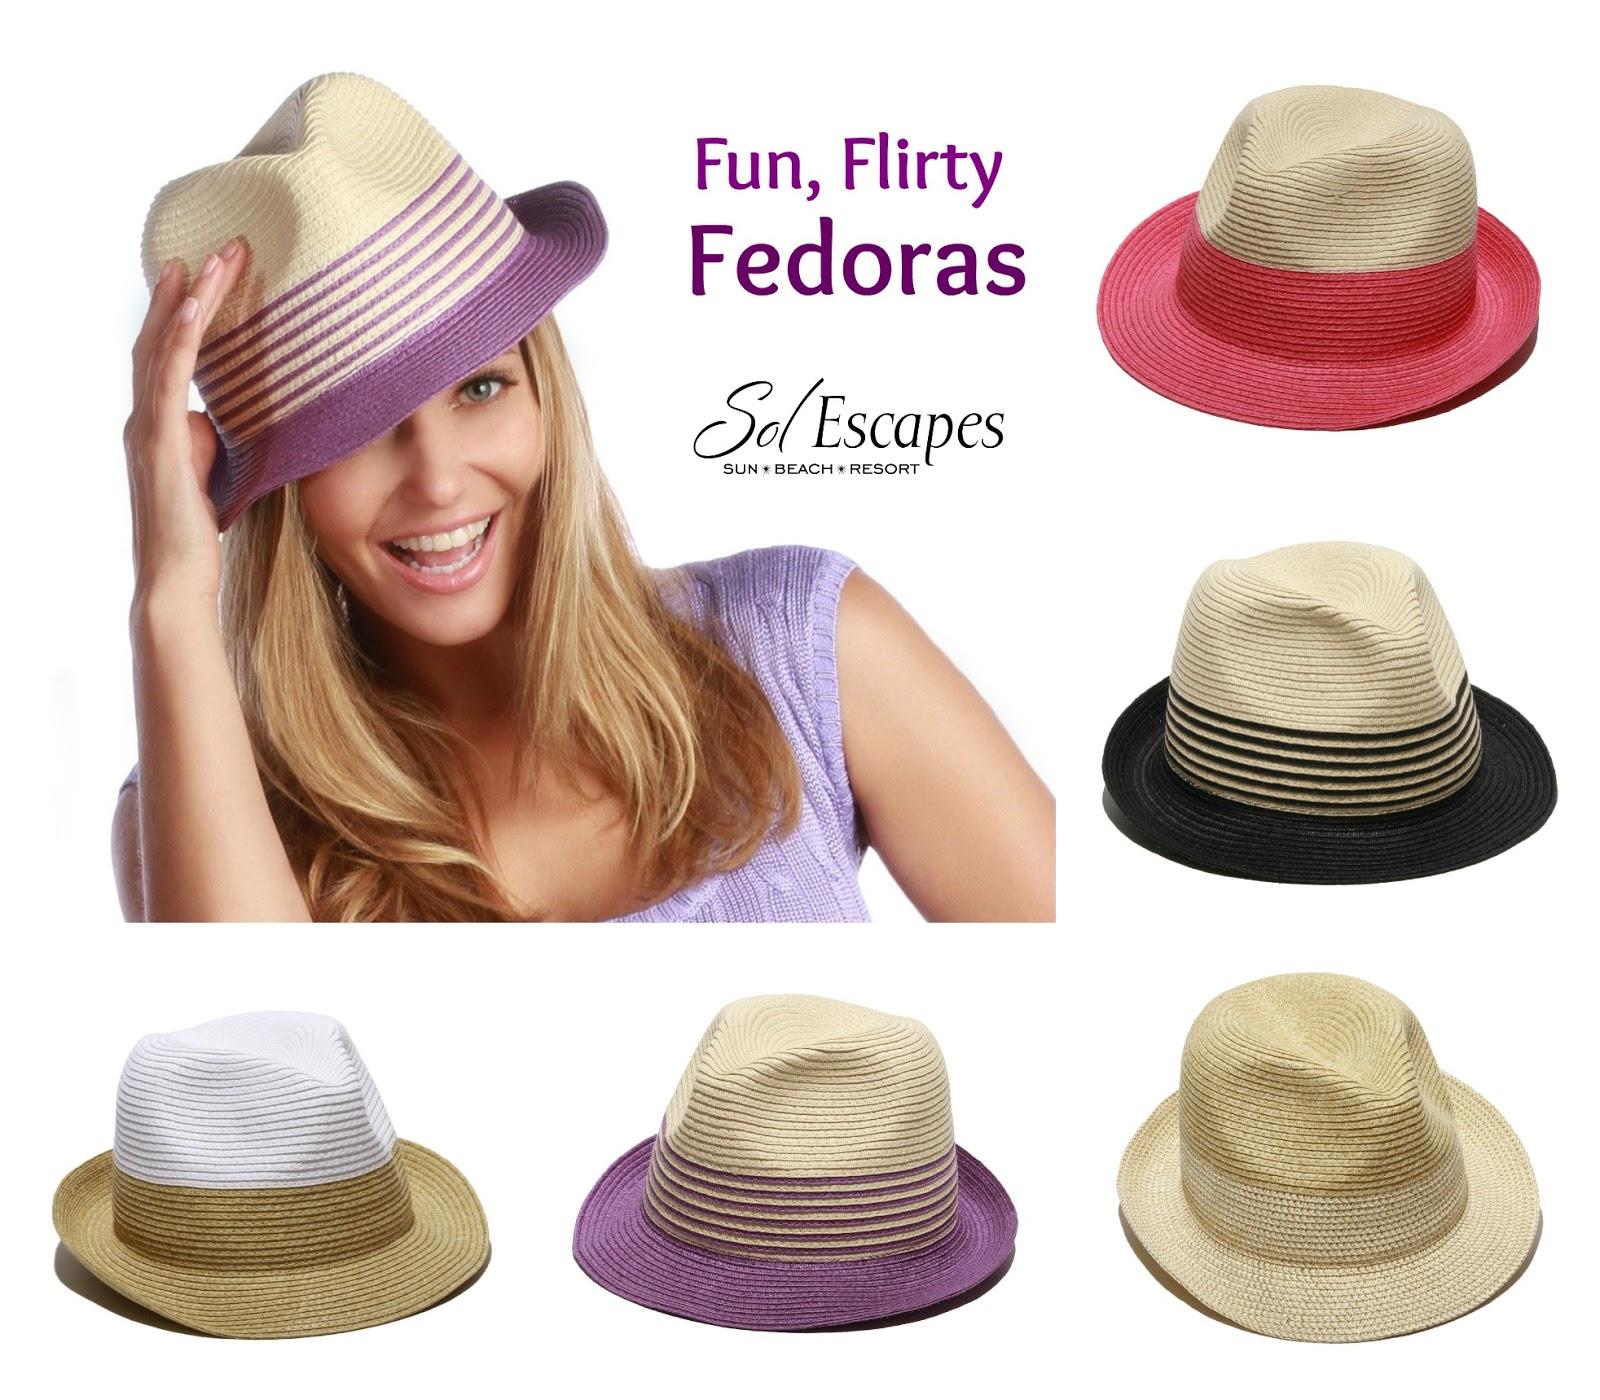 http://www.solescapes.com/Beach-Fedora-Hats-s/1886.htm